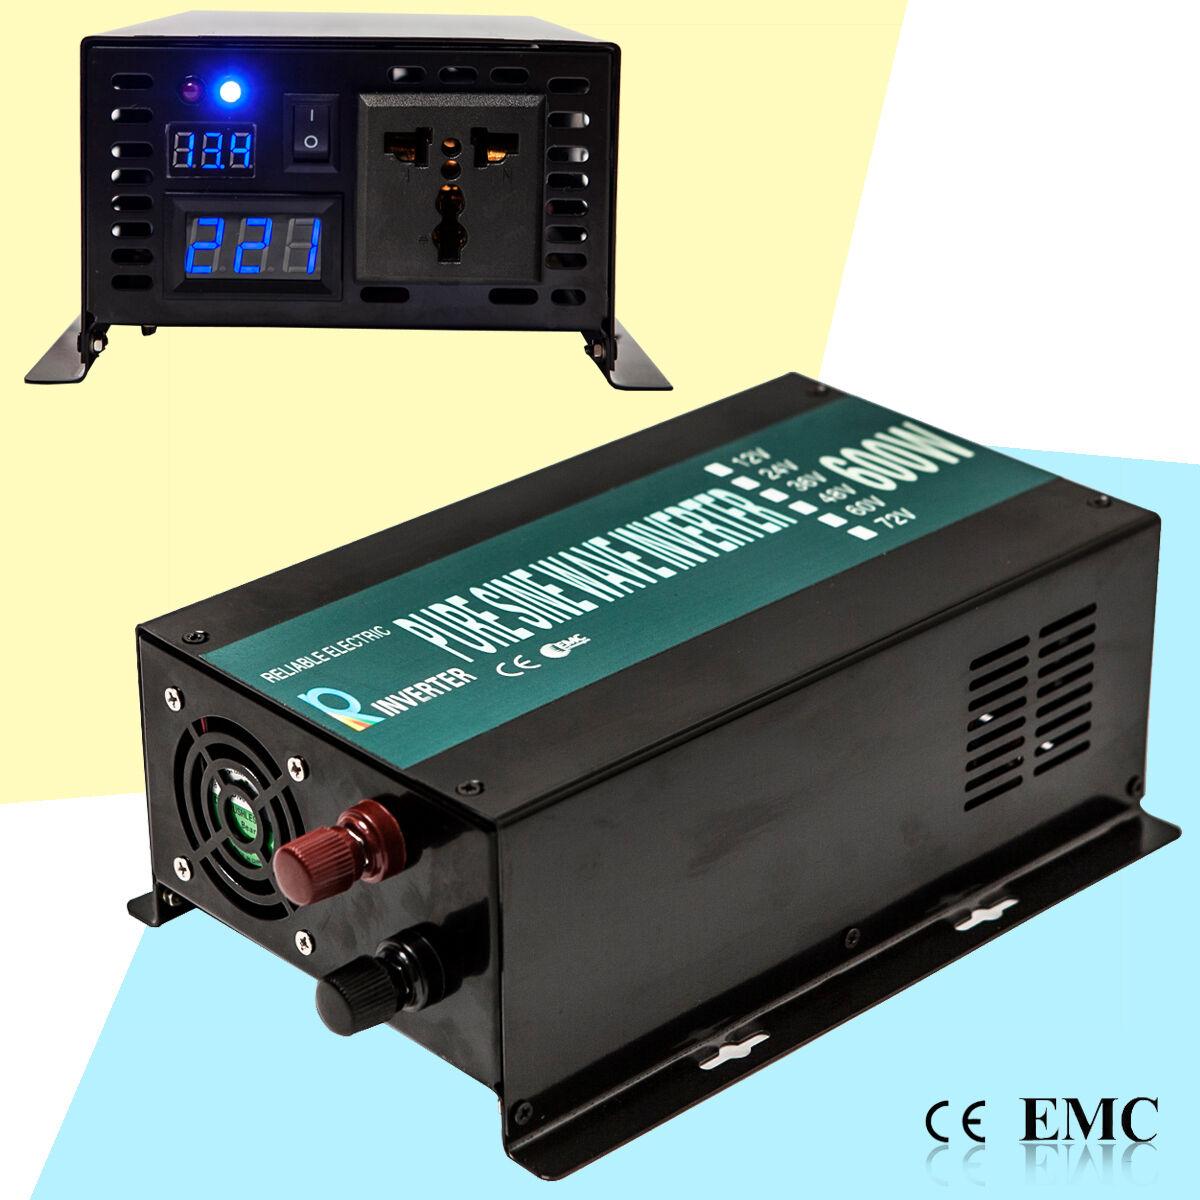 300w Waterproof Grid Tie Inverter Dc22-50v To Ac220v Pure Sine Wave Inverter Ce Photovoltaik-zubehör